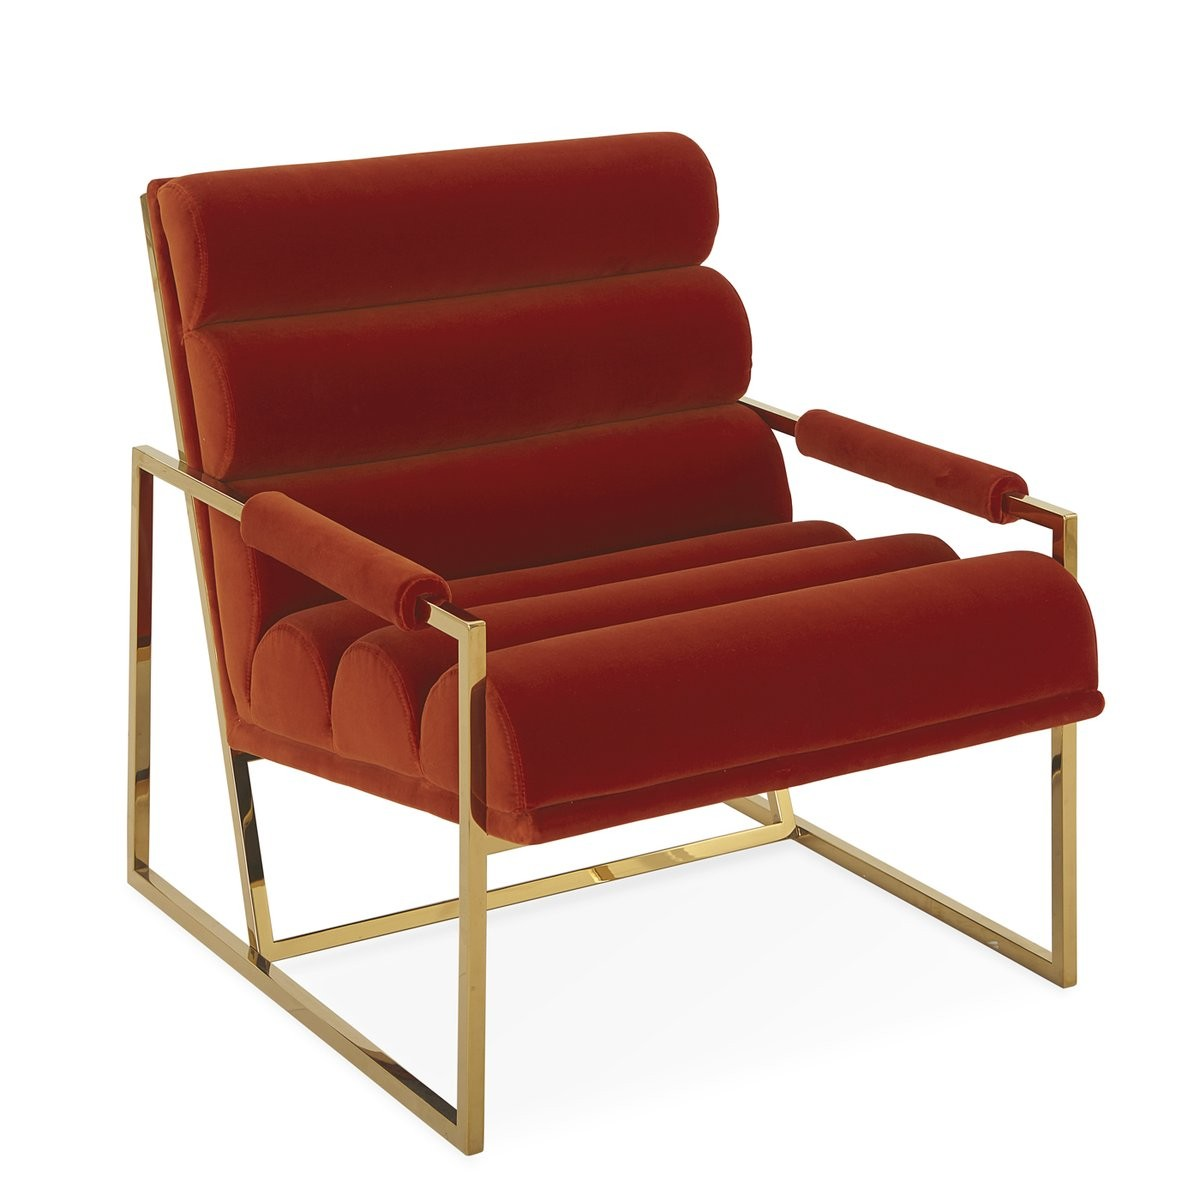 Jonathan Adler I Channeled Goldfinger Lounge Chair I Varese Persimmon